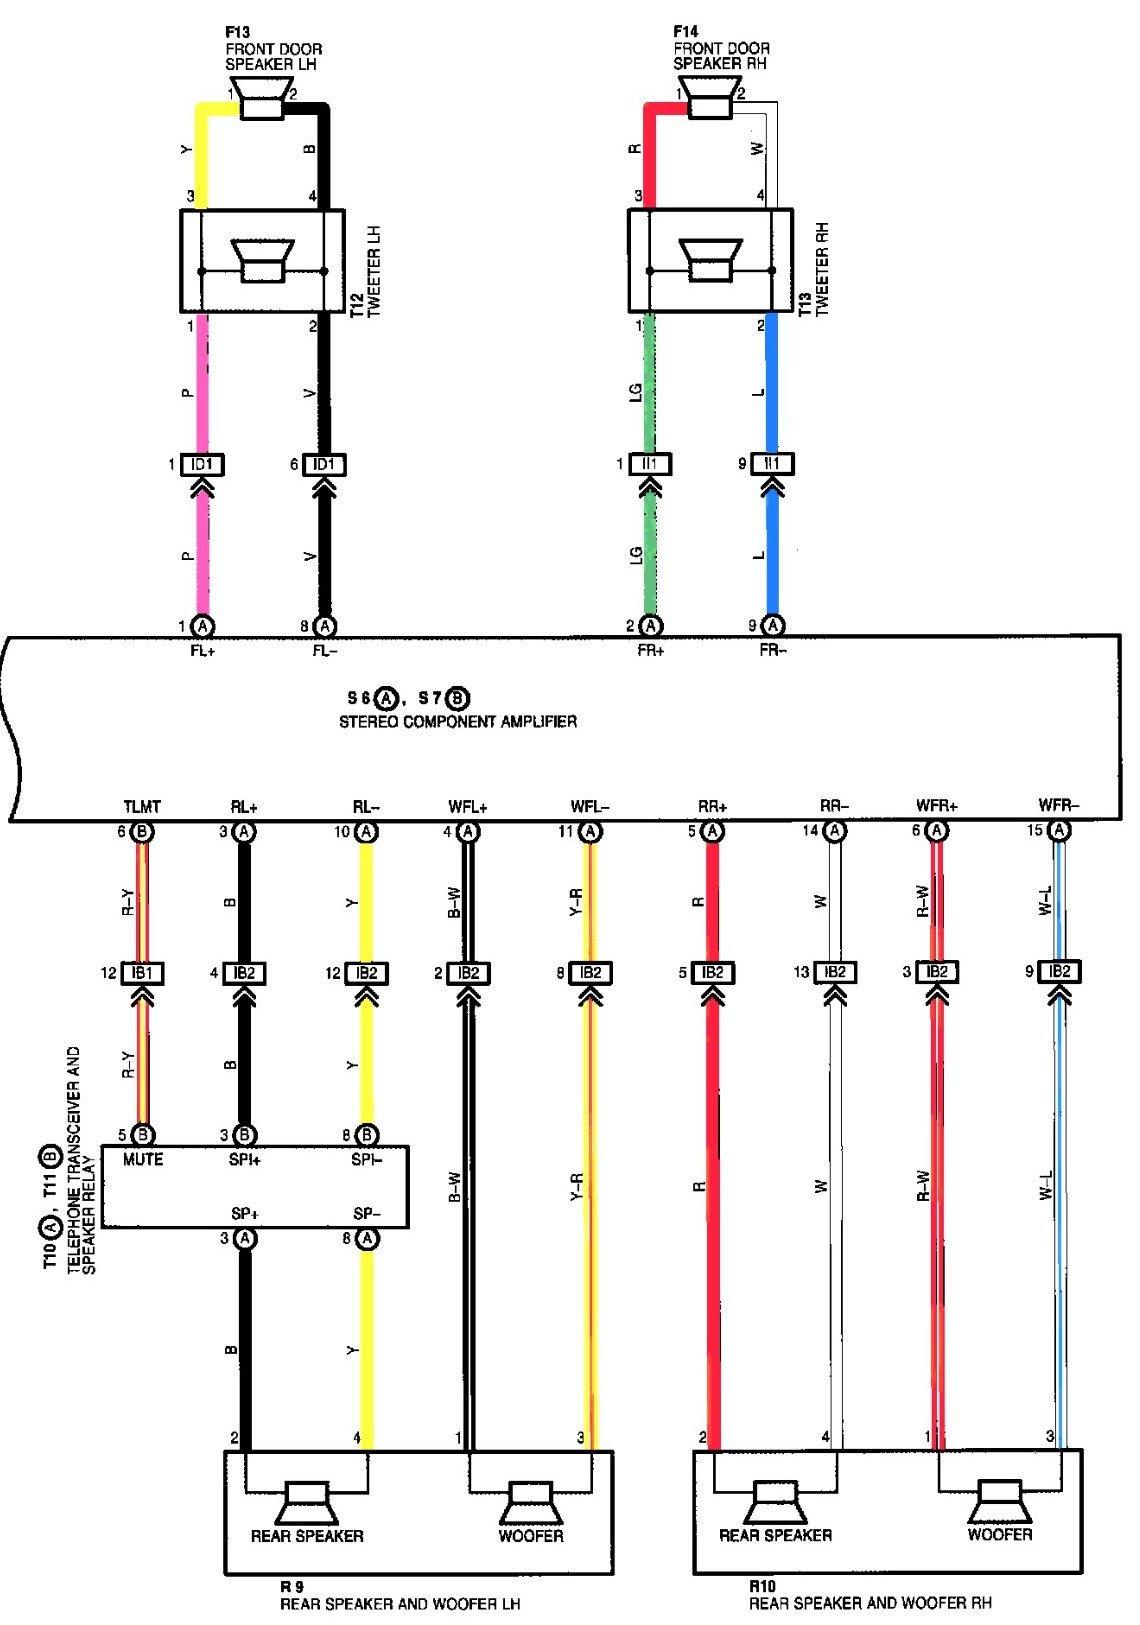 lexus is300 headlight wiring diagram 35 2001 lexus is300 radio wiring diagram wiring diagram list  35 2001 lexus is300 radio wiring